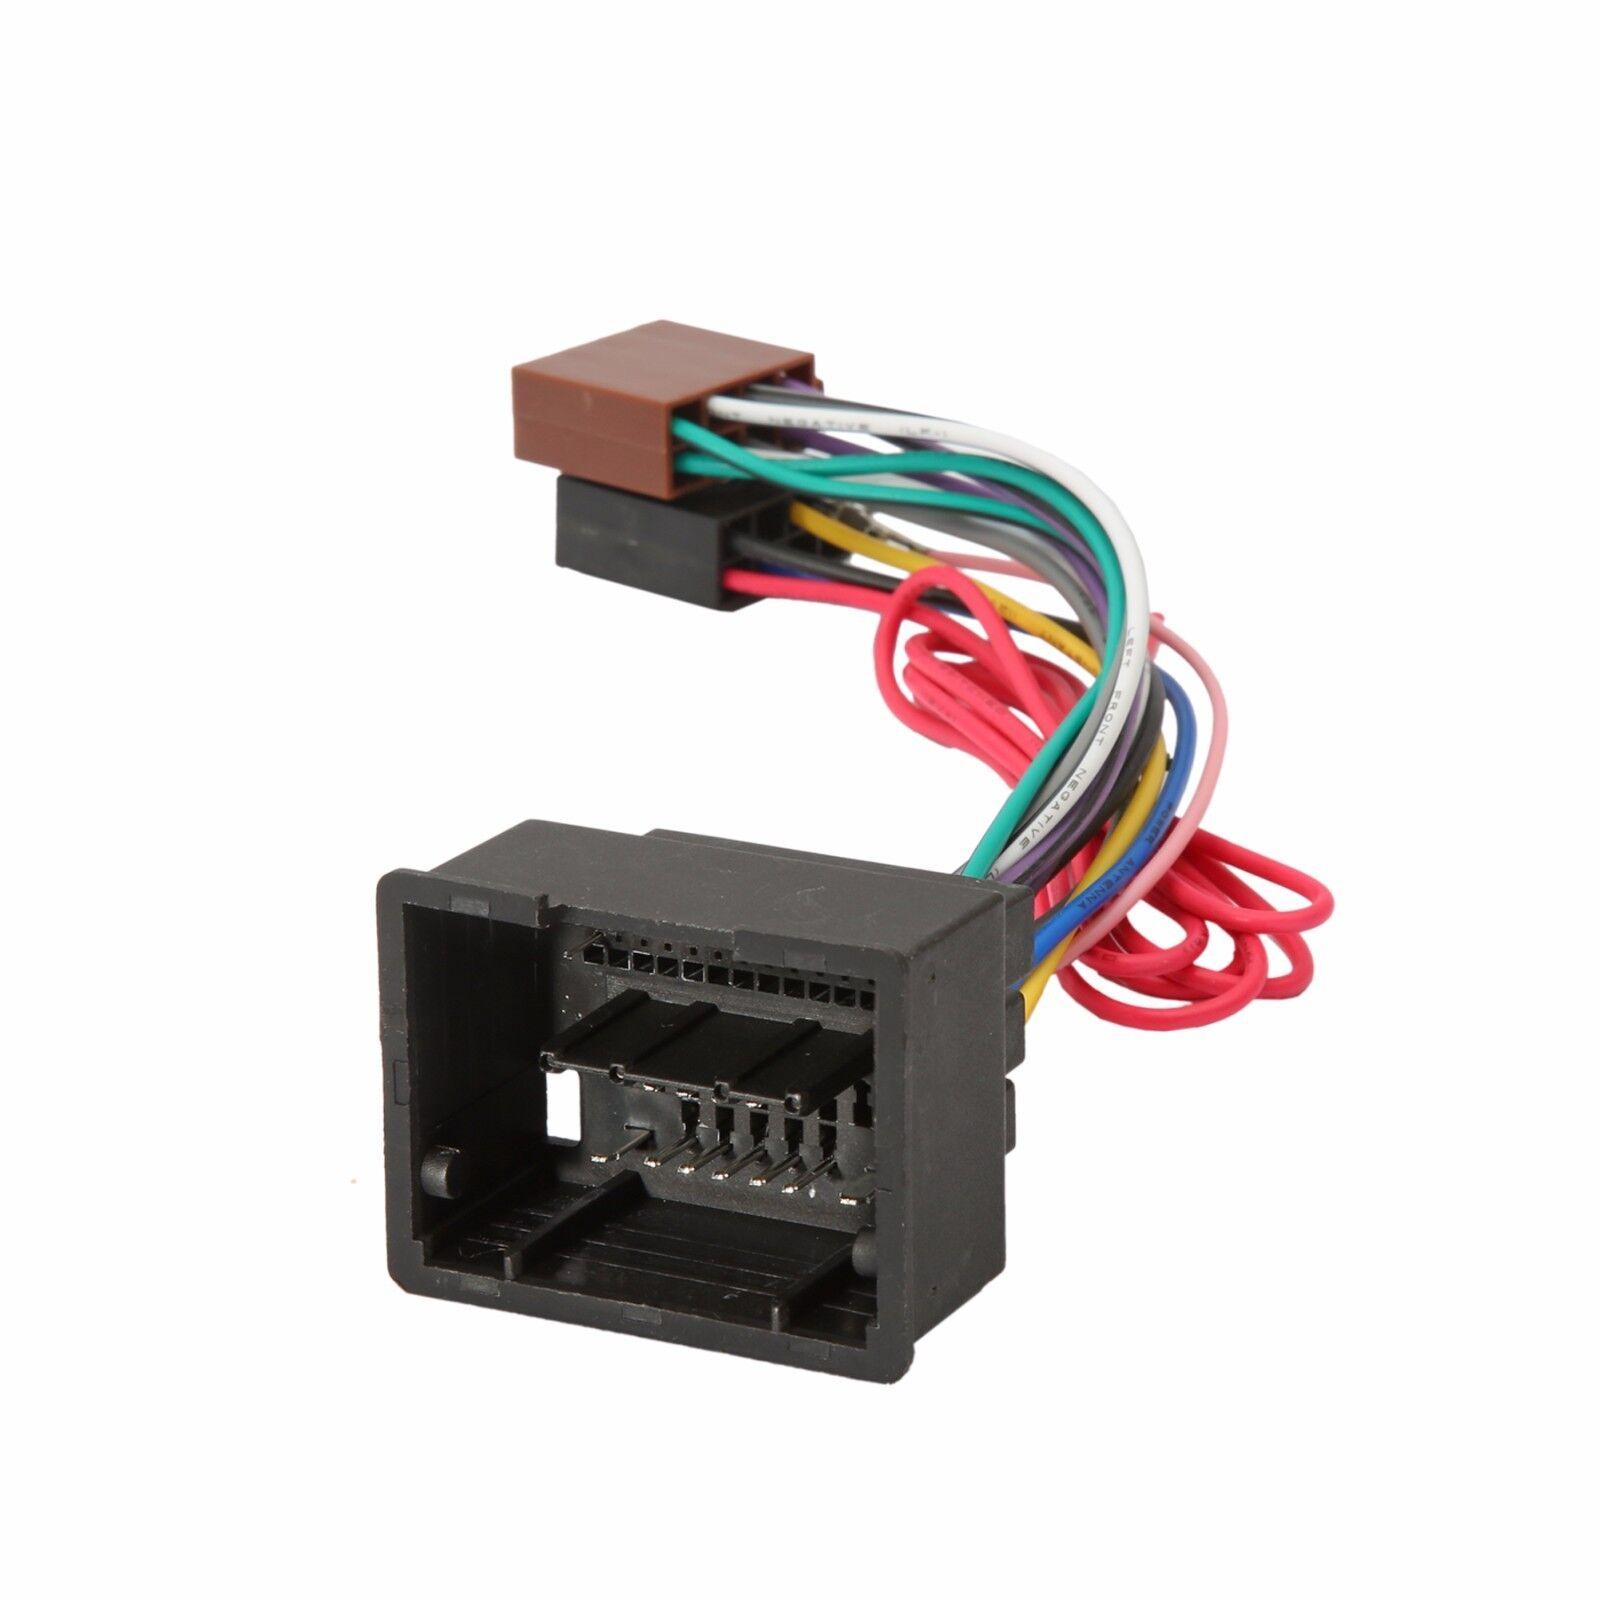 vauxhall insignia 09 u003e iso radio stereo harness adapter wiring rh ebay co uk